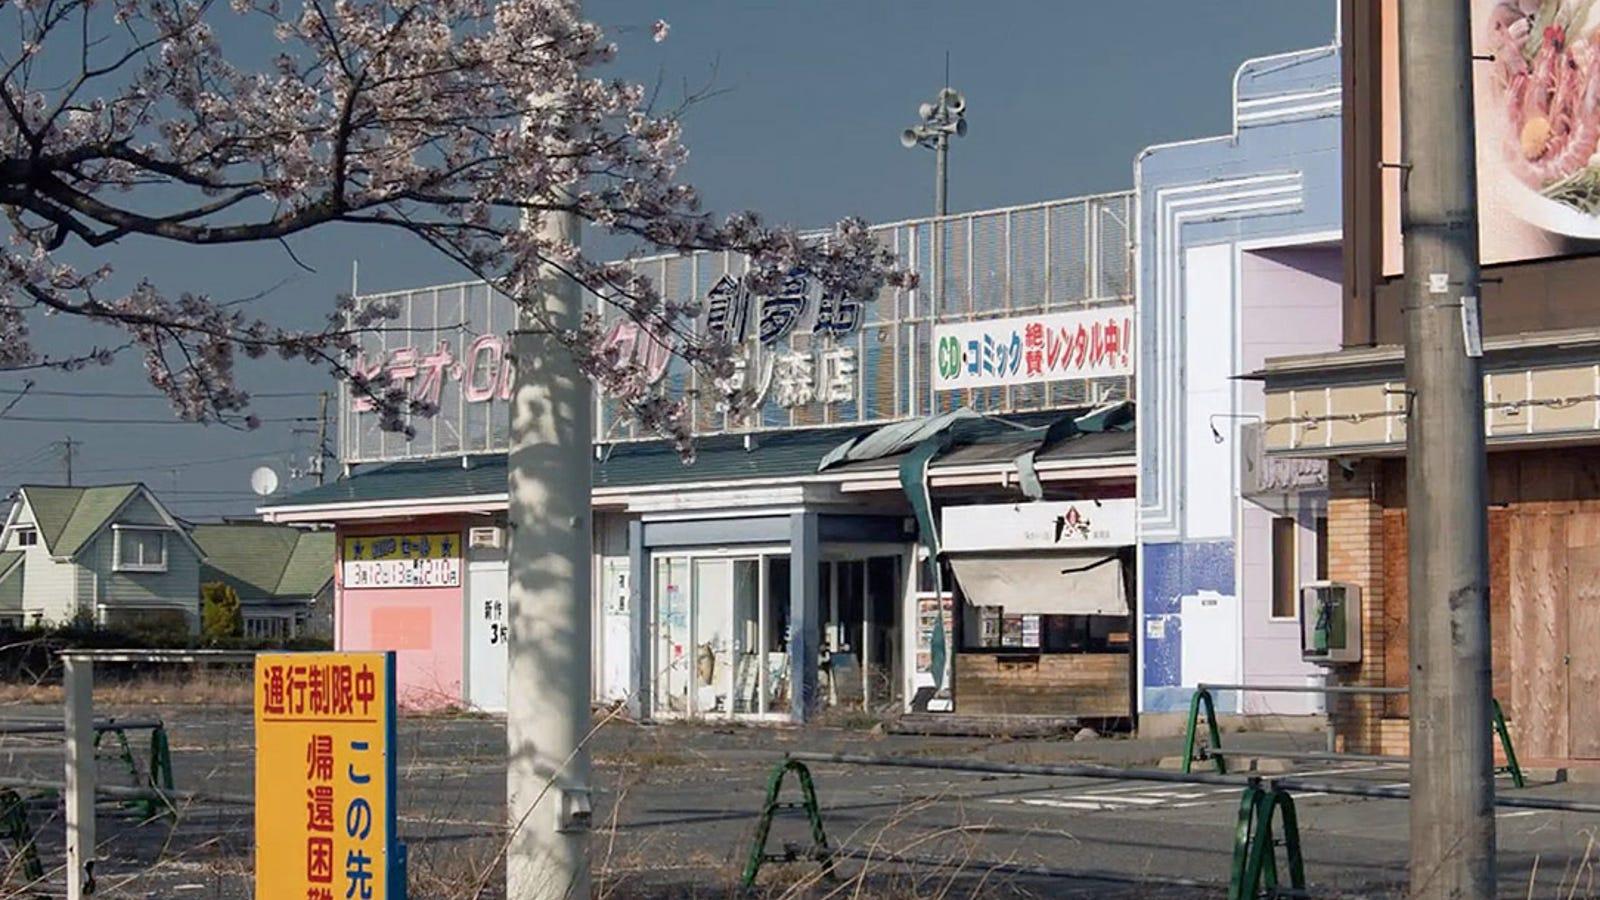 Descubre el escalofriante paisaje de Fukushima, a vista de dron